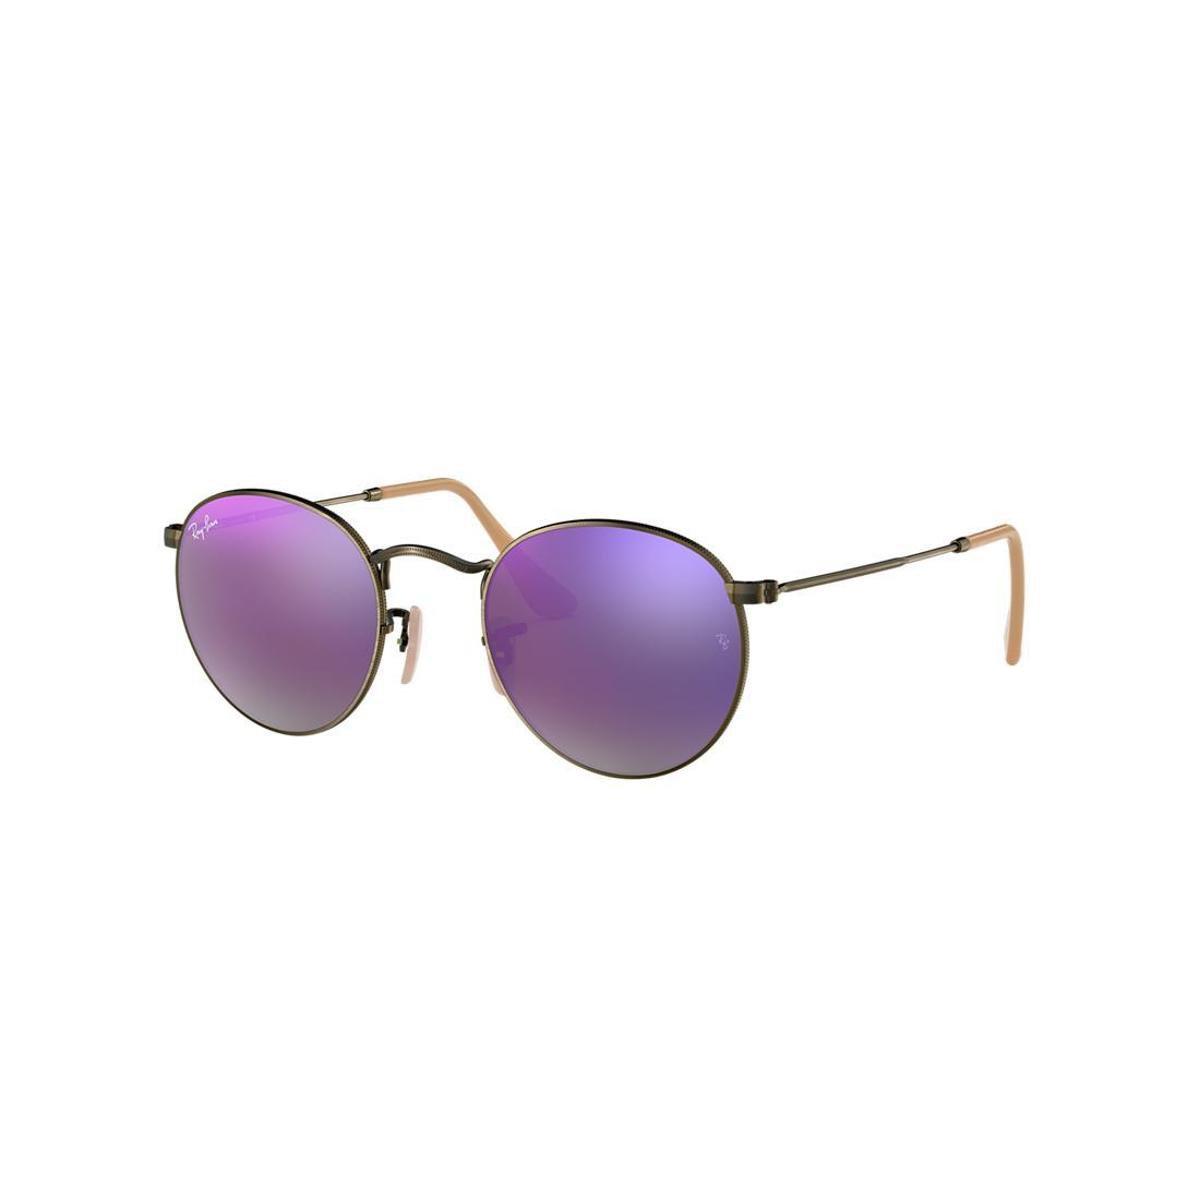 Óculos de Sol Ray-Ban RB3447 Round Metal Lentes Espelhadas - Compre ... 79b432c436